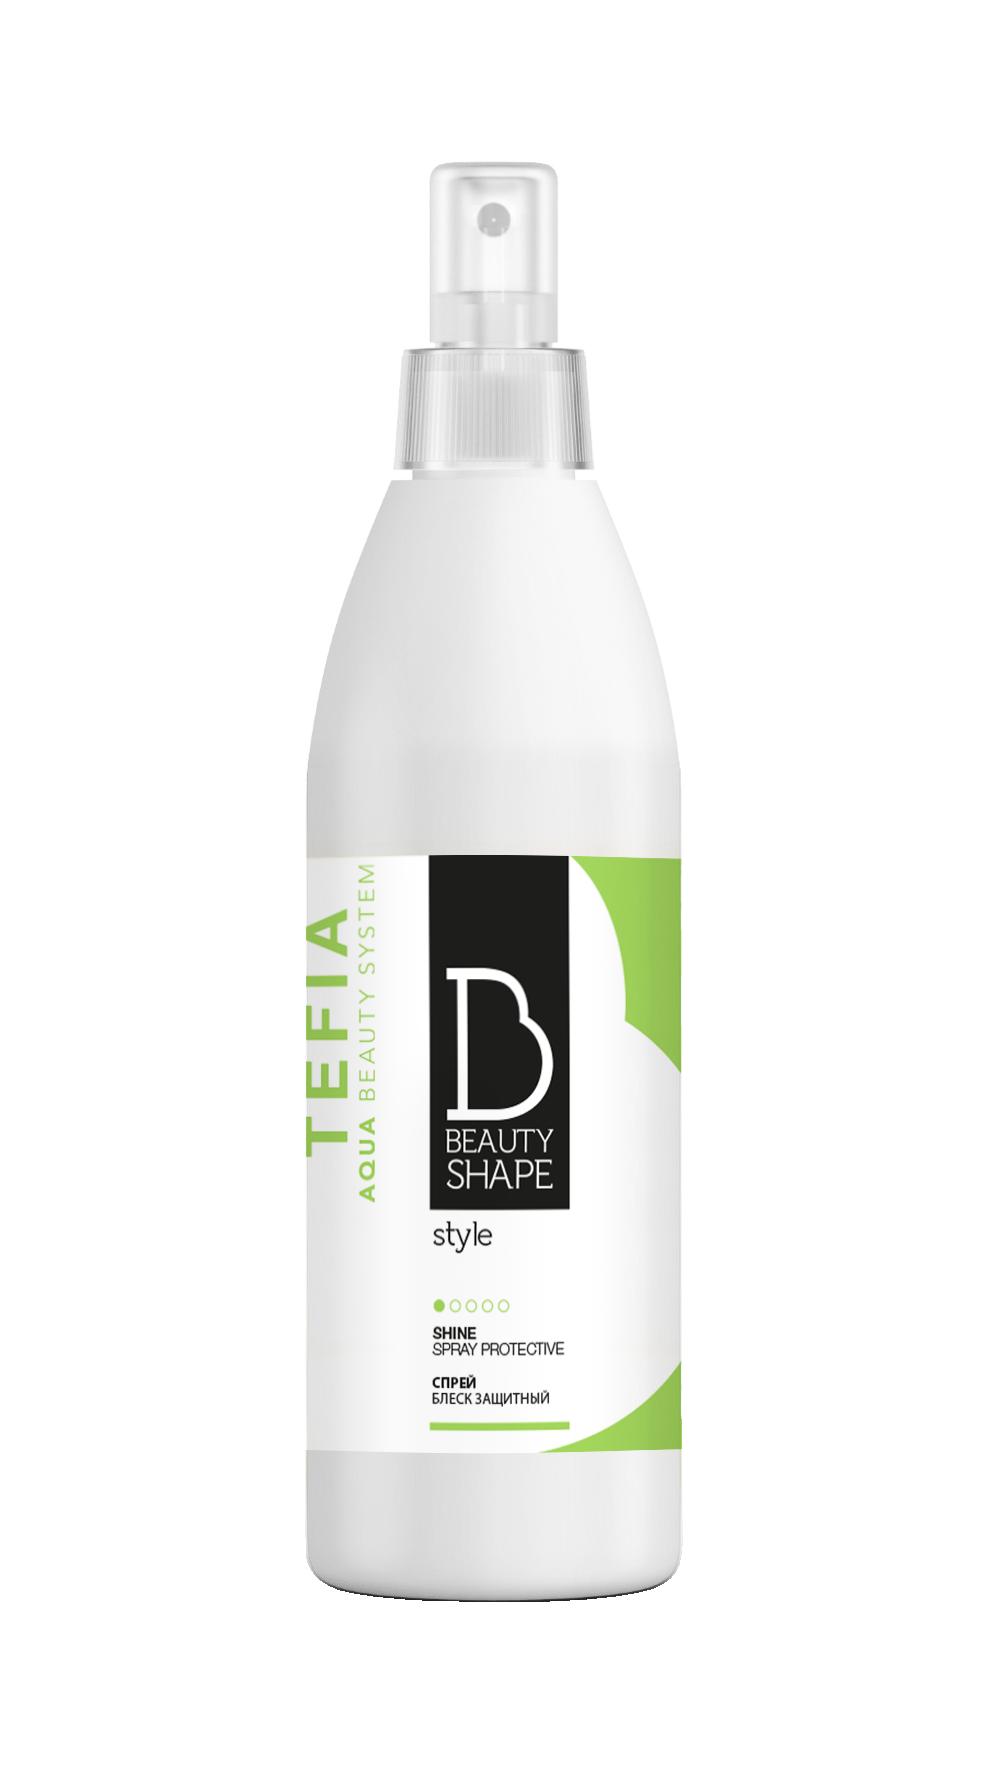 TEFIA Спрей-блеск защитный / Beauty Shape Style 250 мл